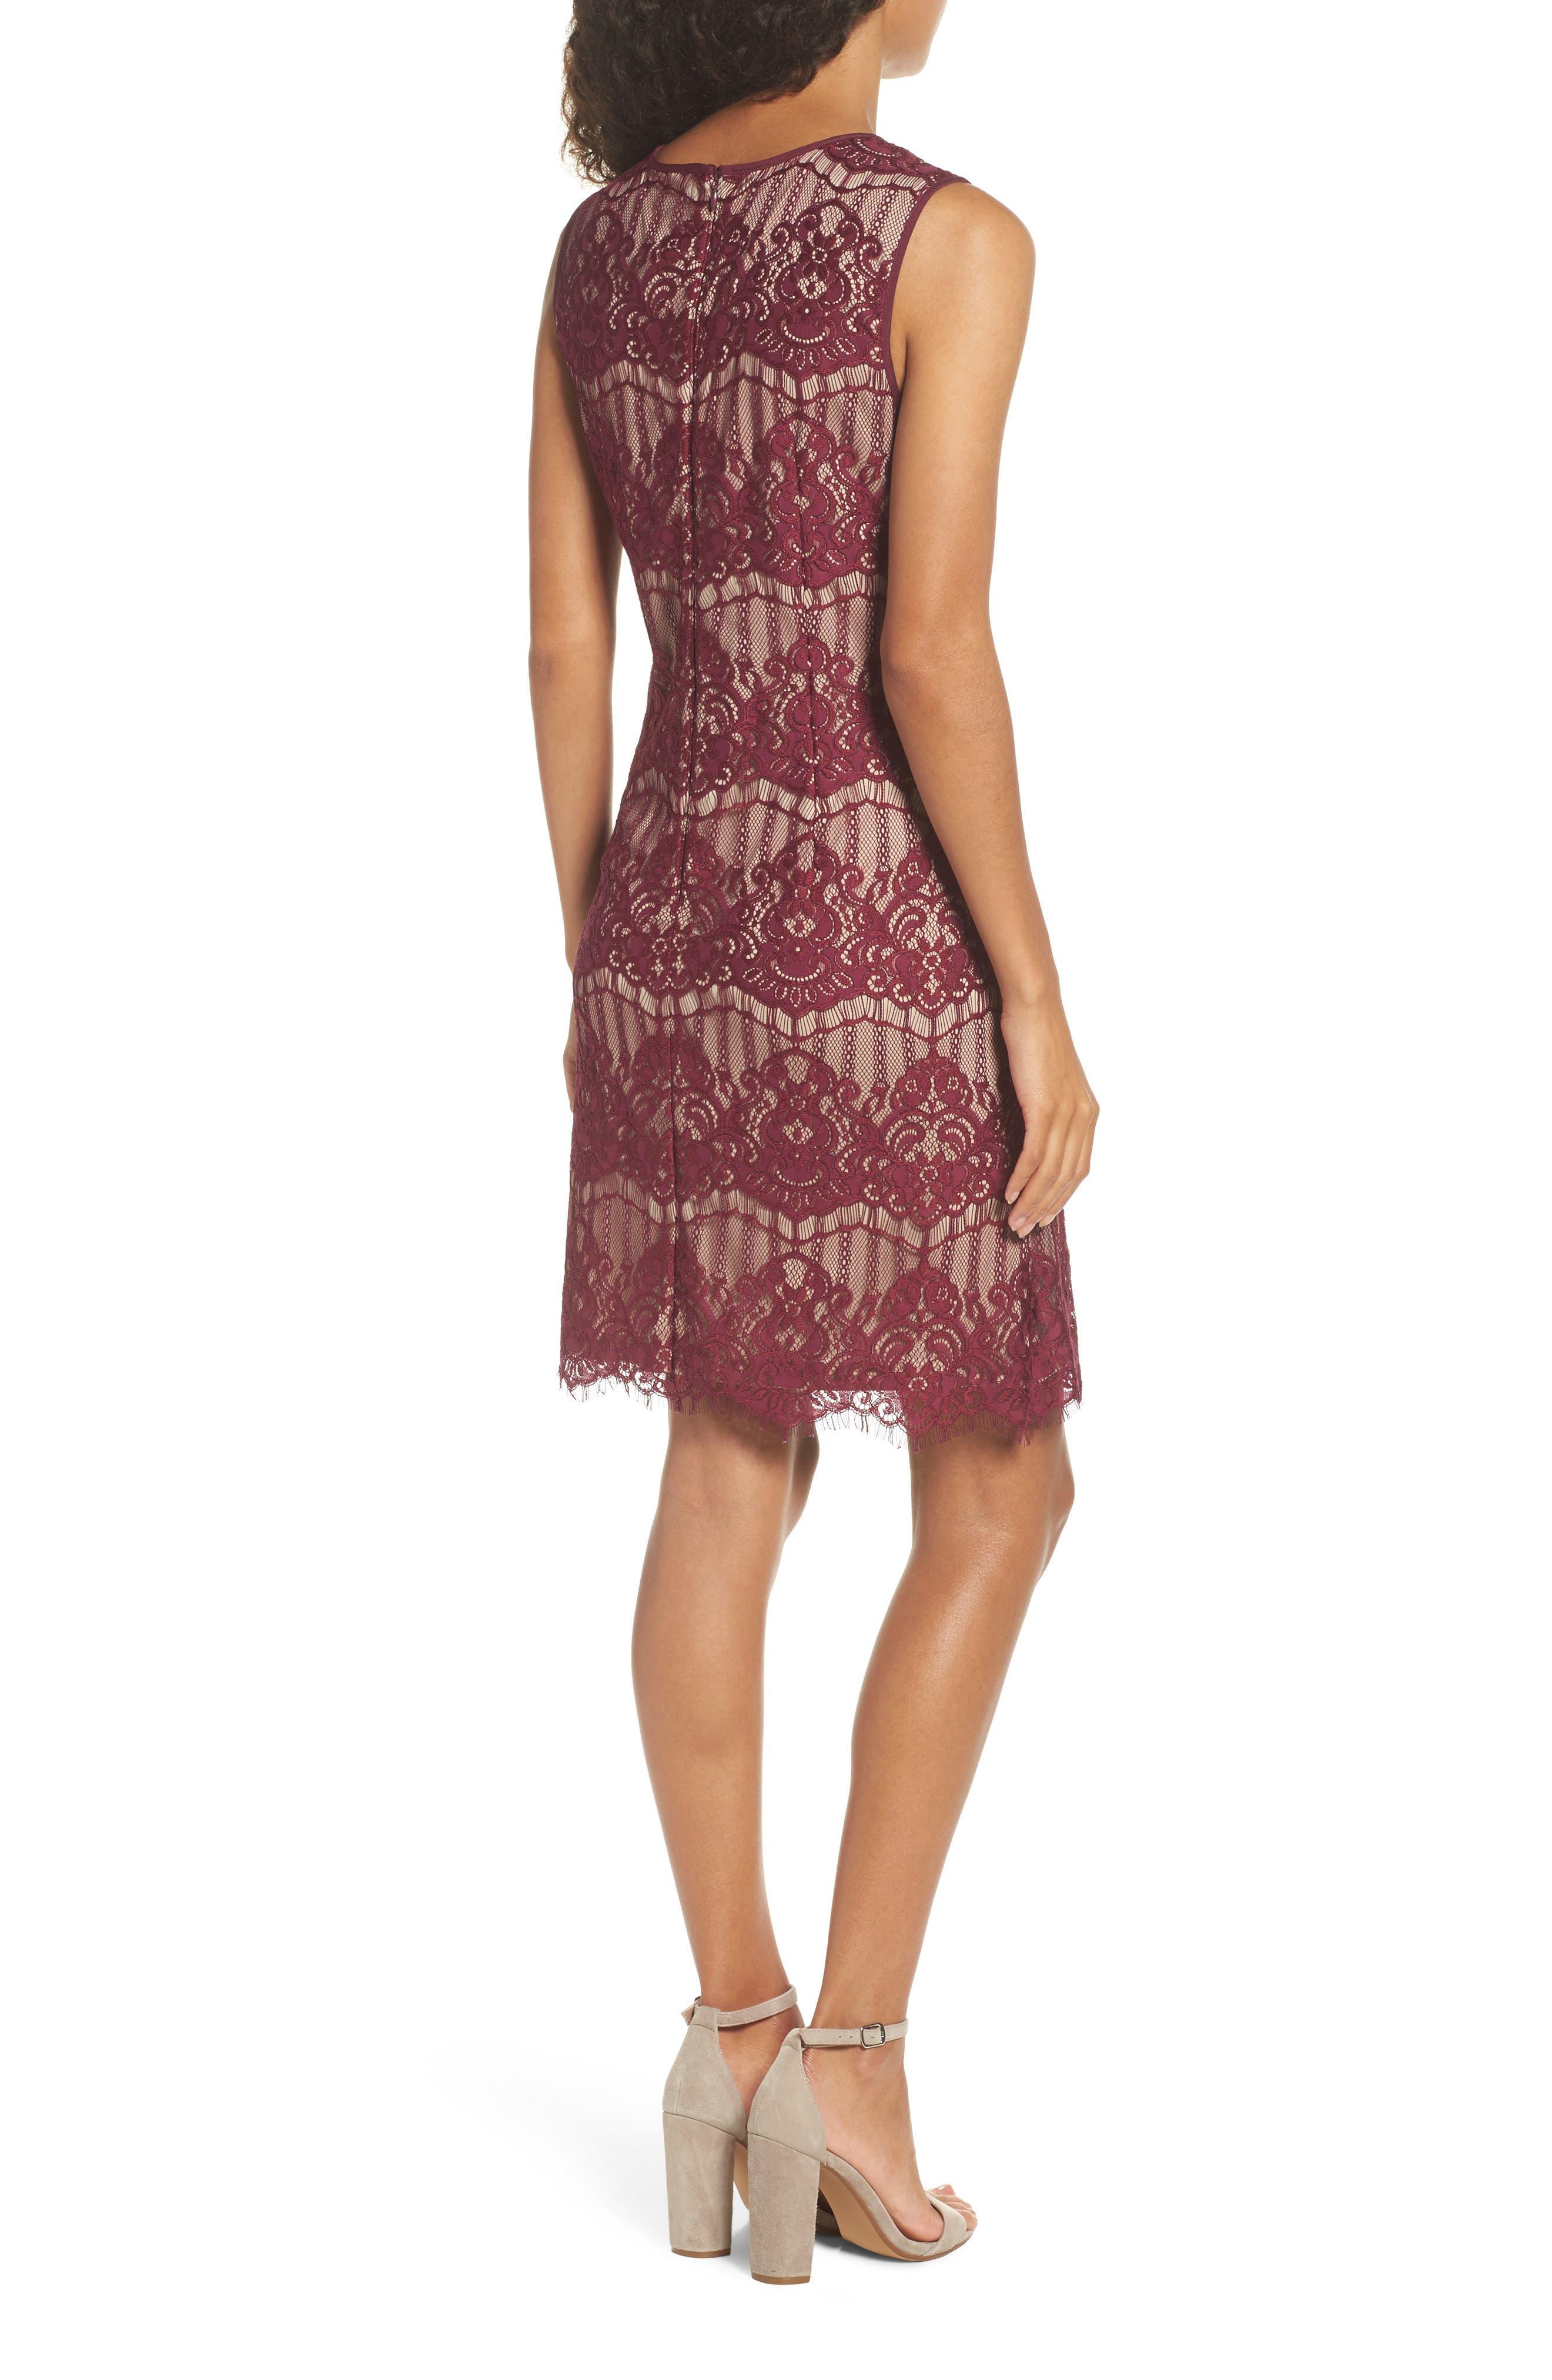 Scalloped Lace Sheath Dress,                             Alternate thumbnail 2, color,                             640